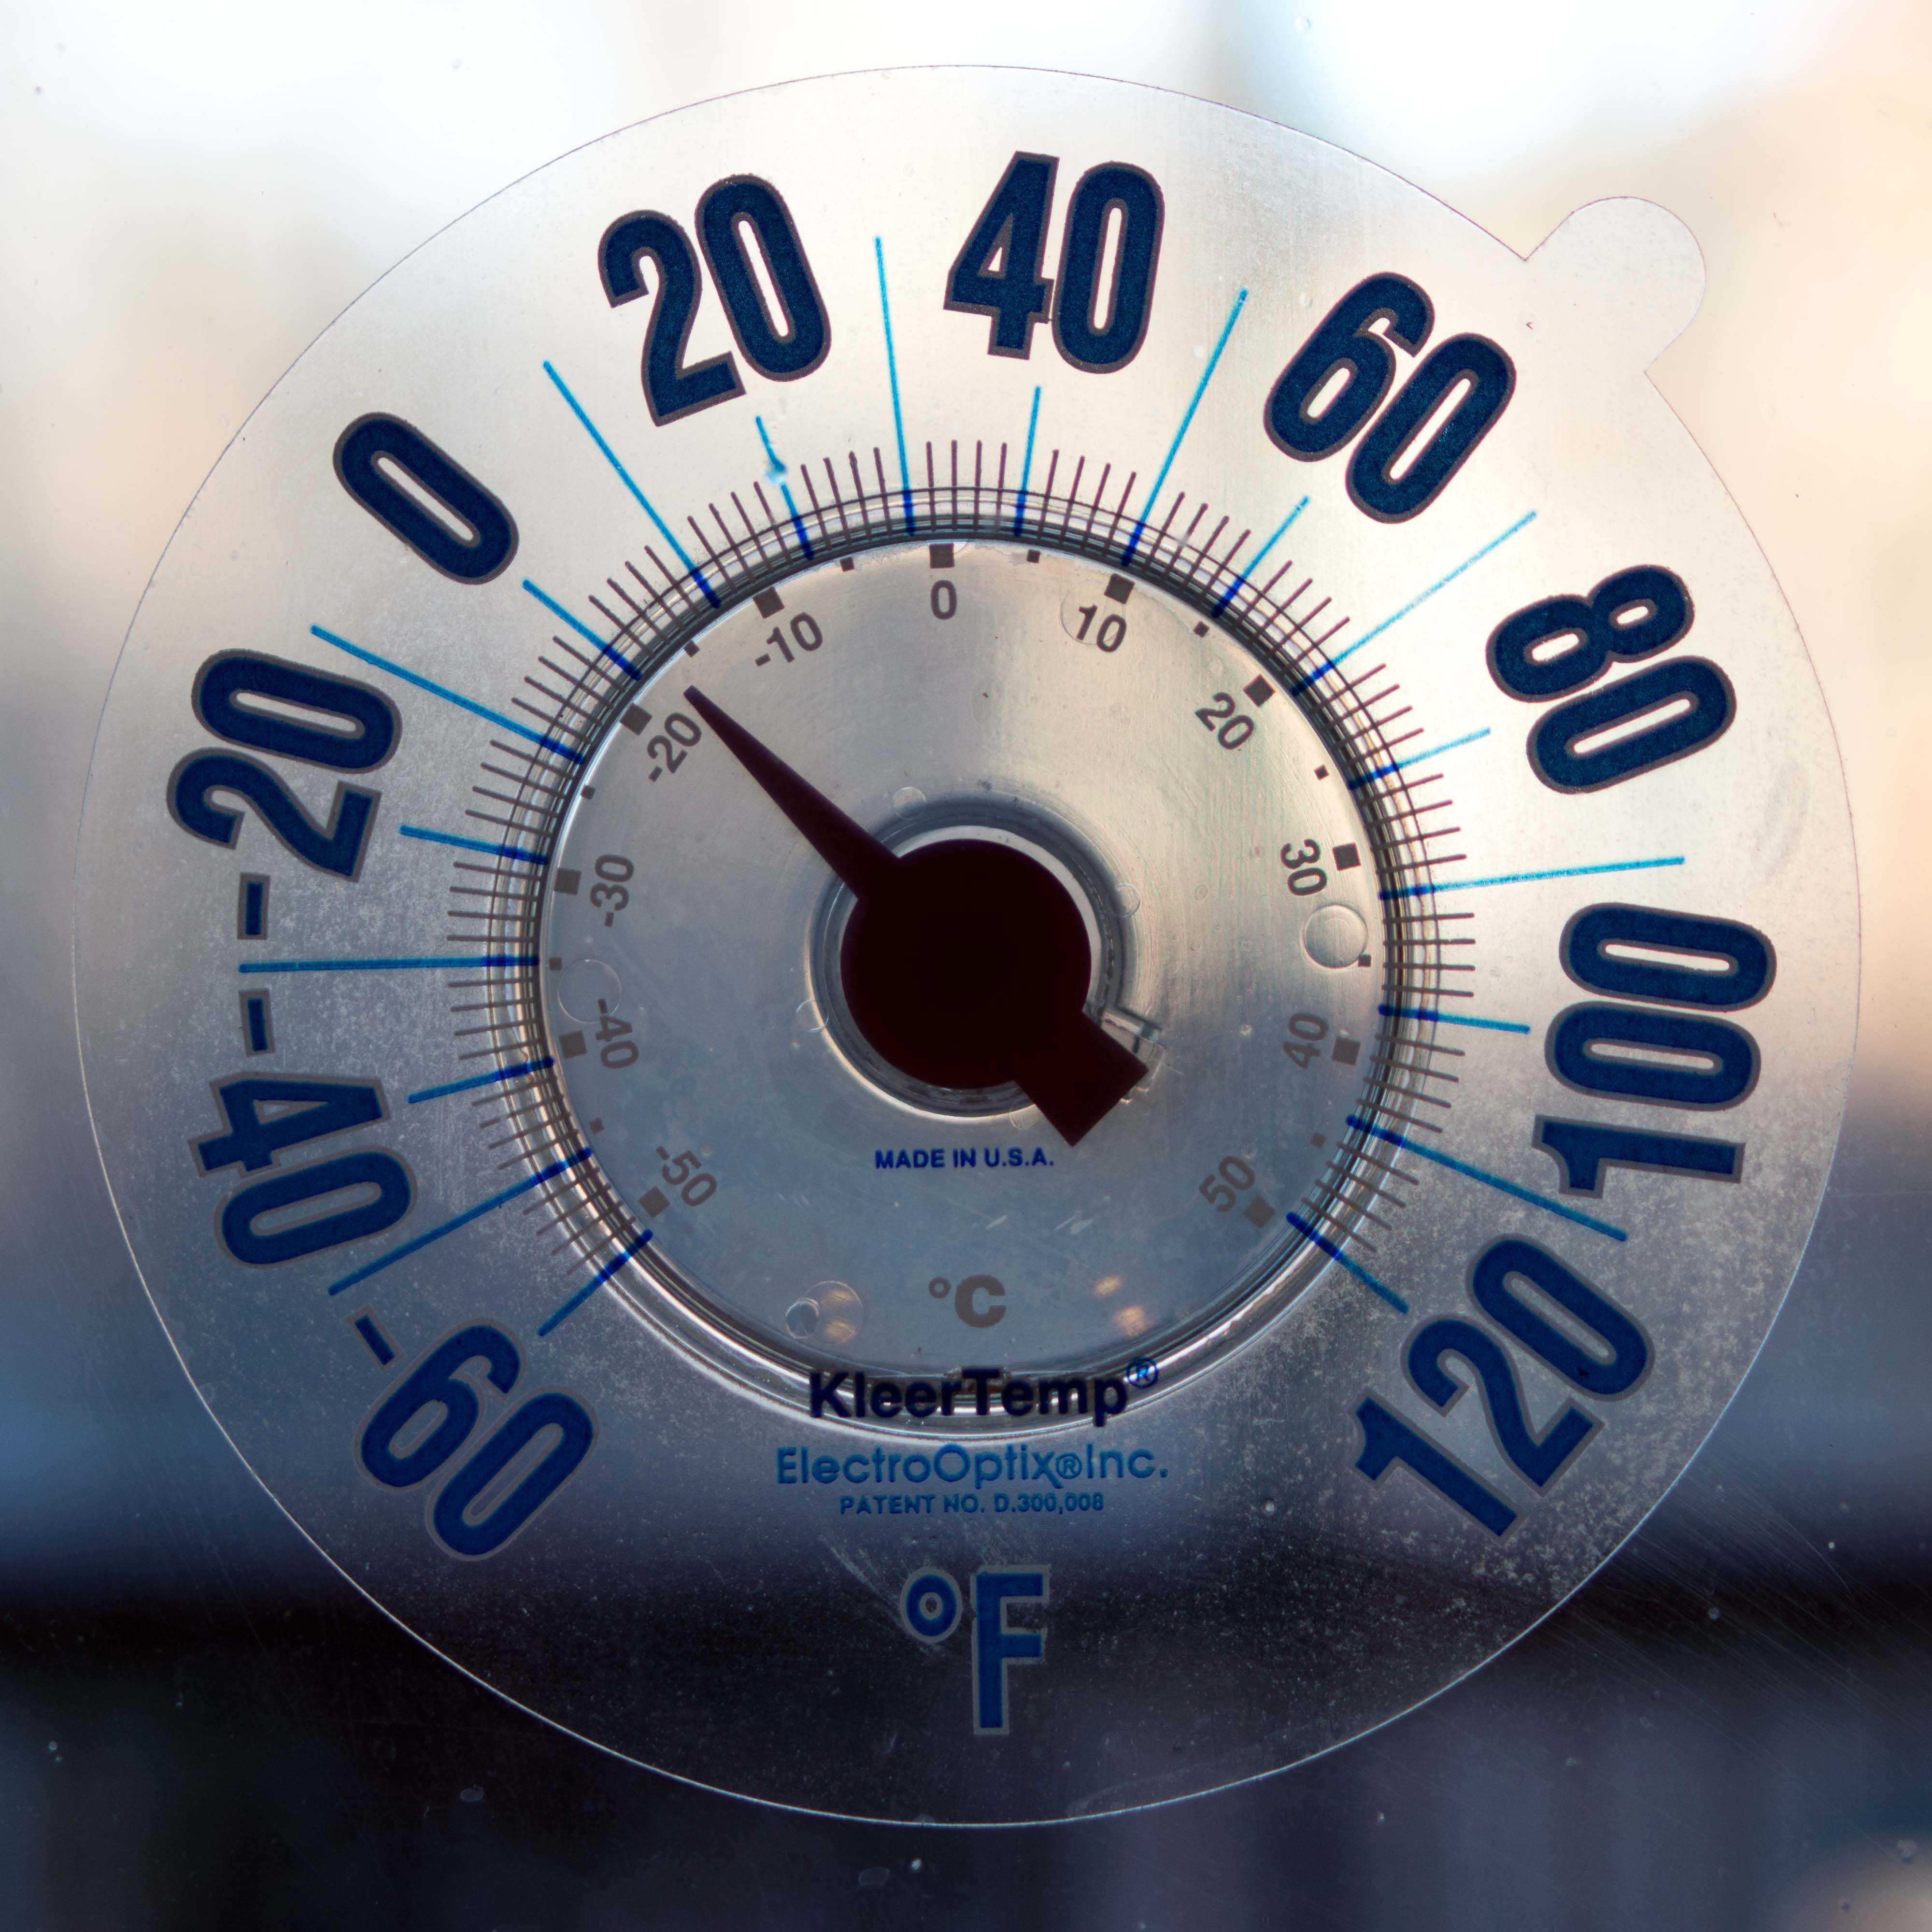 A local temperature at 8:45 a.m. was just above zero degrees Fahrenheit in Fairfax, Va.